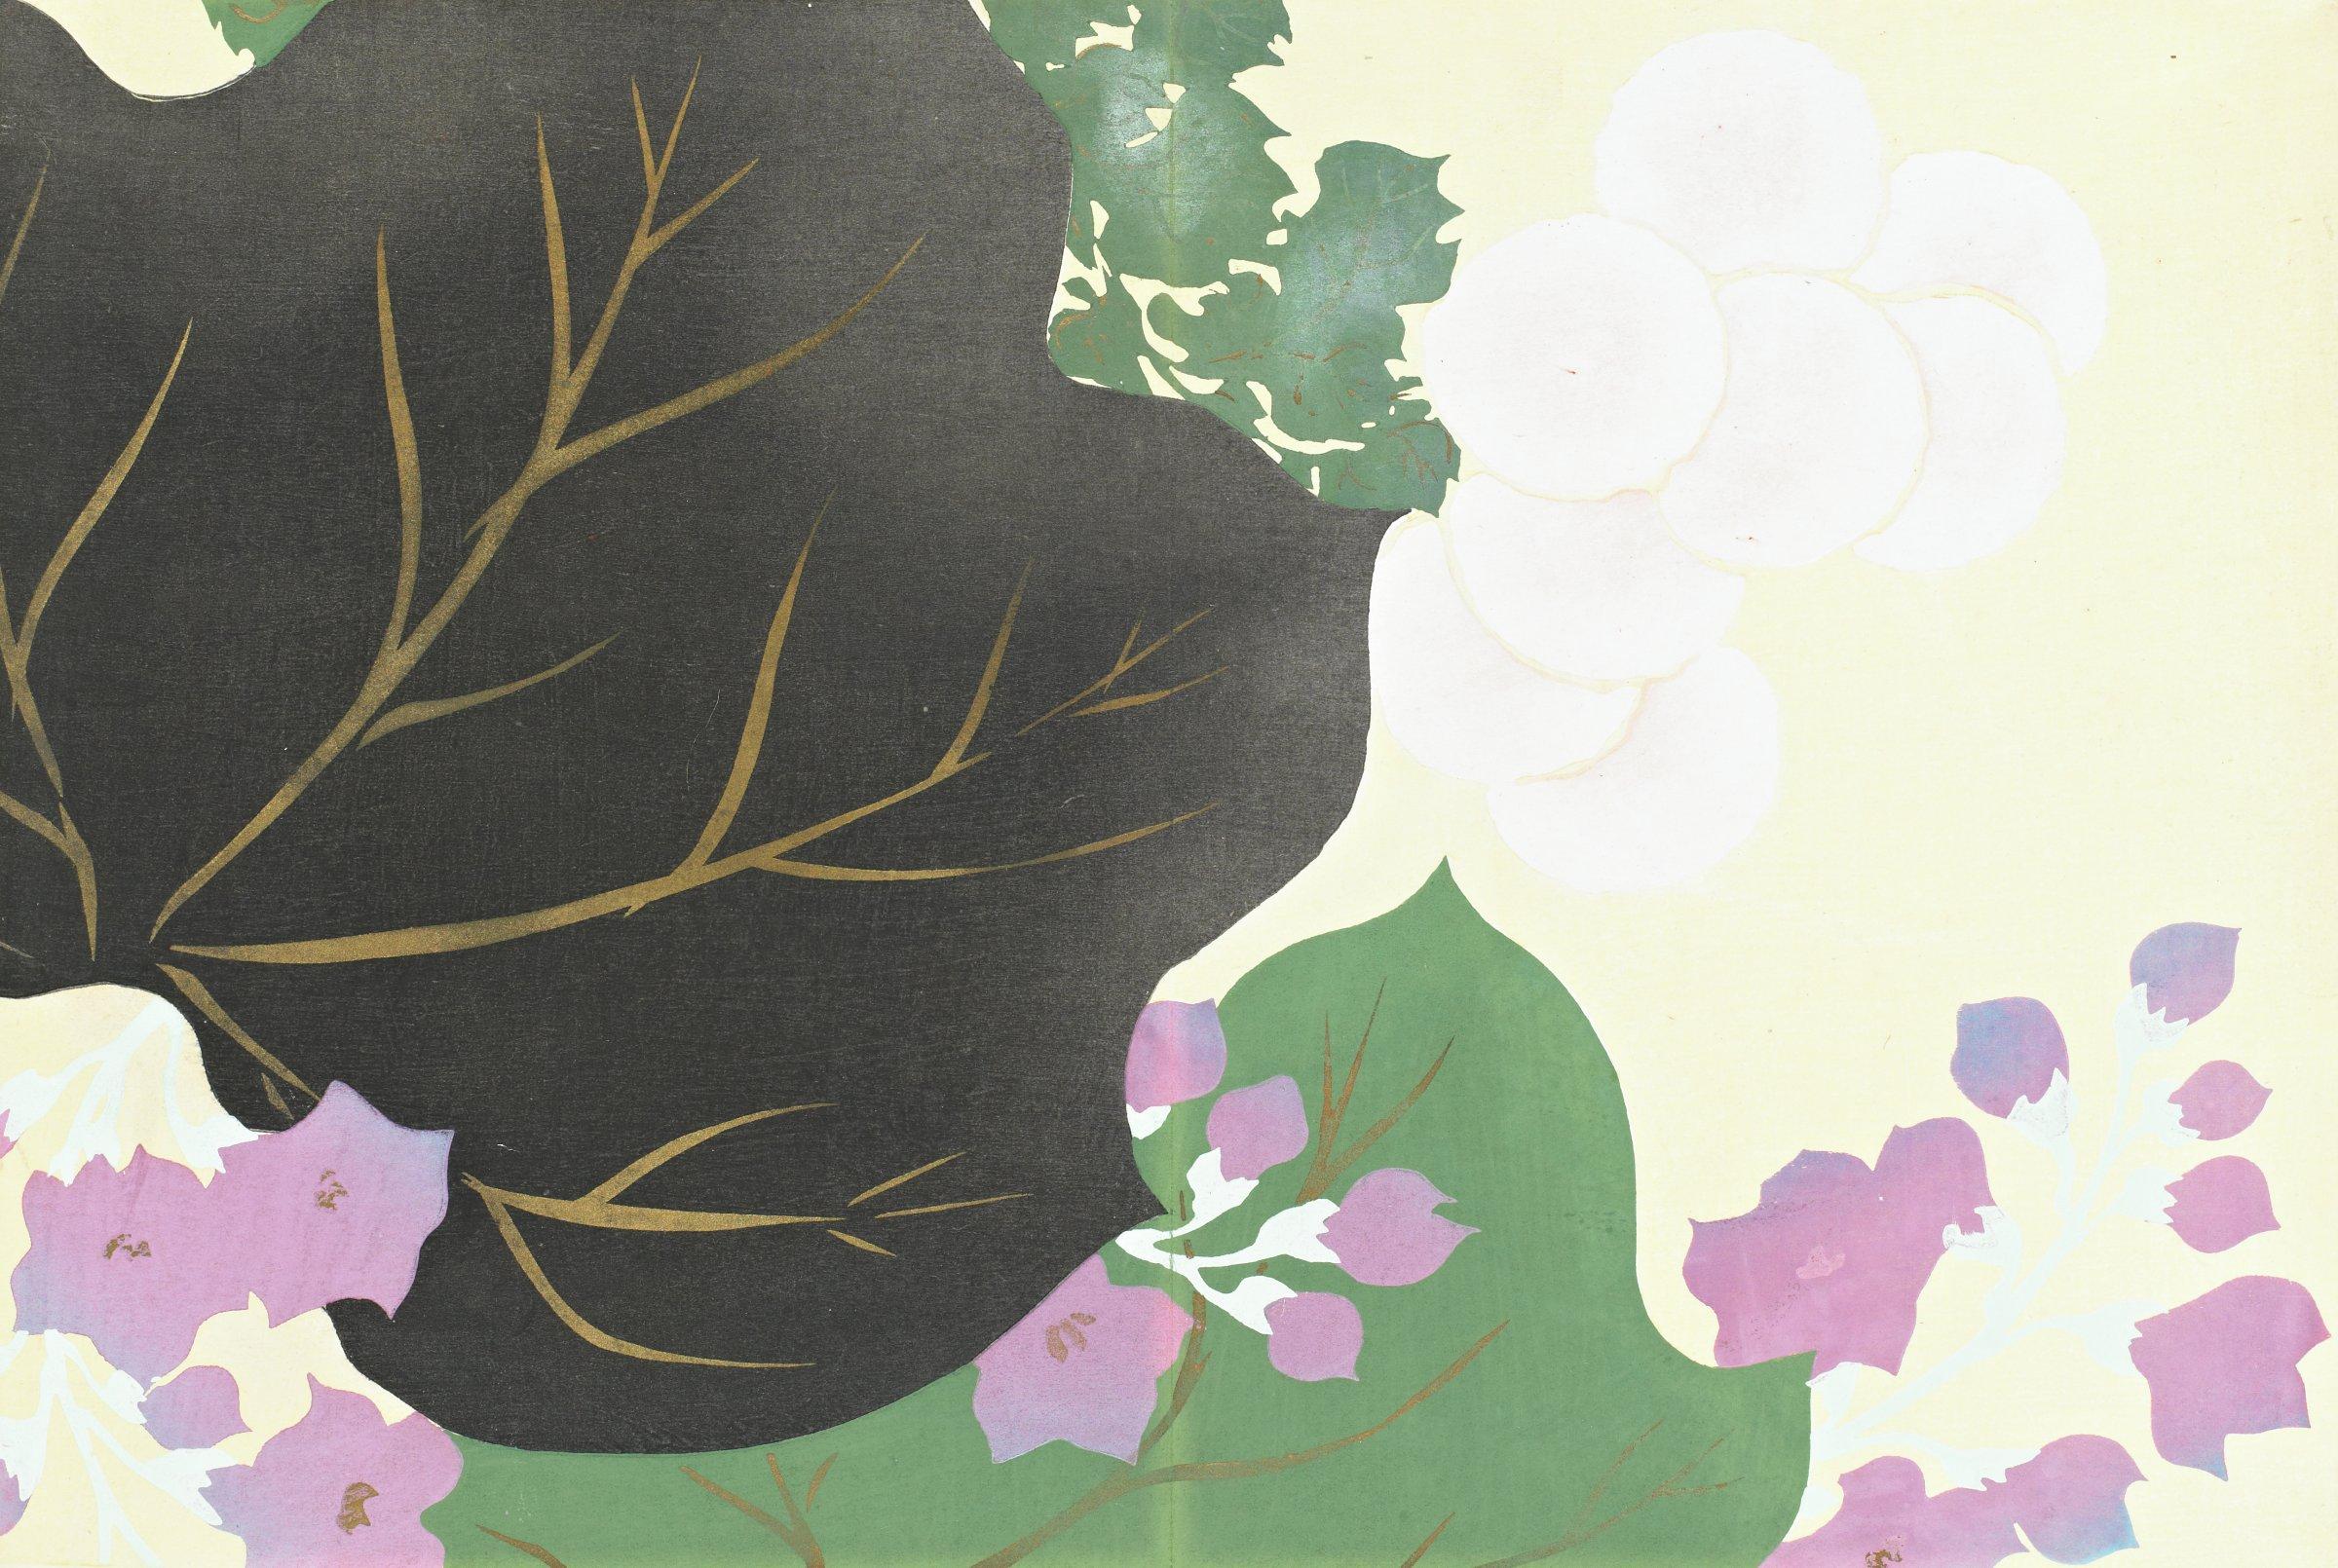 Kiku, Kiri (Chrysanthemum and Paulownia), from Momoyogusa (A World of Things), Volume 3, Kamisaka Sekka, ink and color on paper